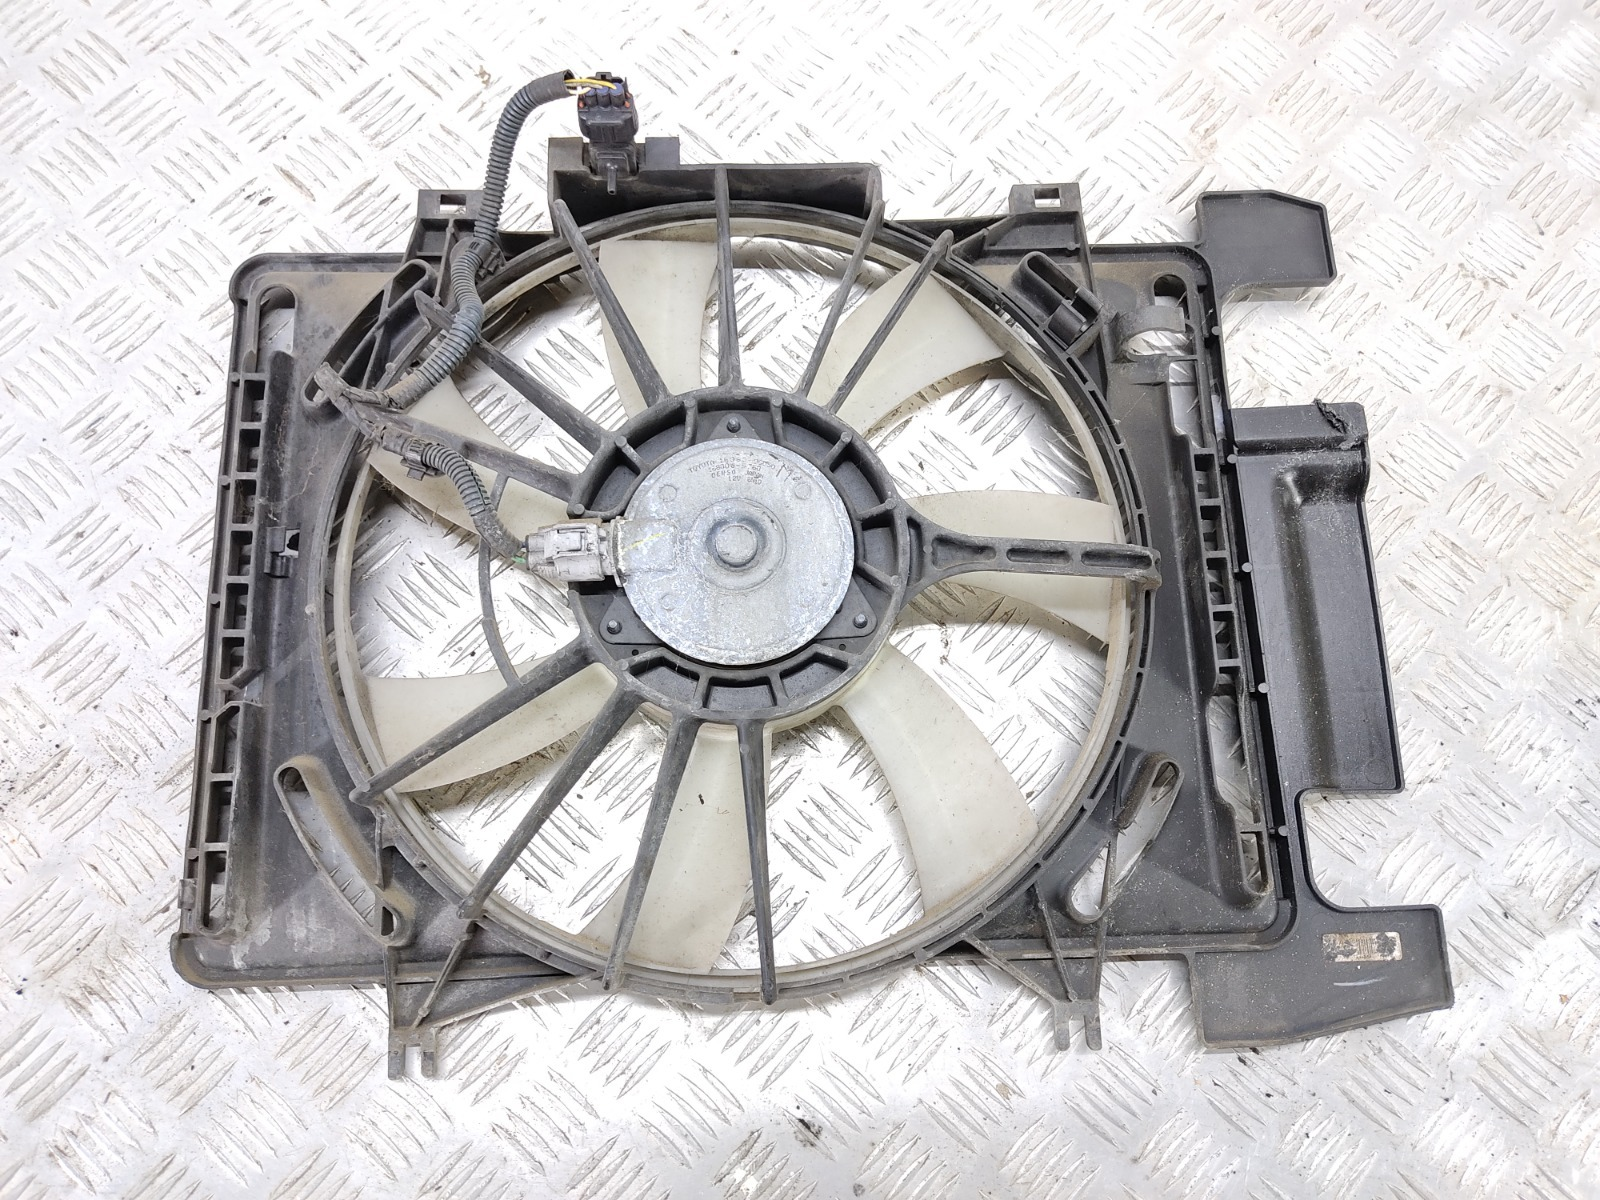 Вентилятор радиатора Toyota Yaris XP9 1.4 D-4D 2006 (б/у)